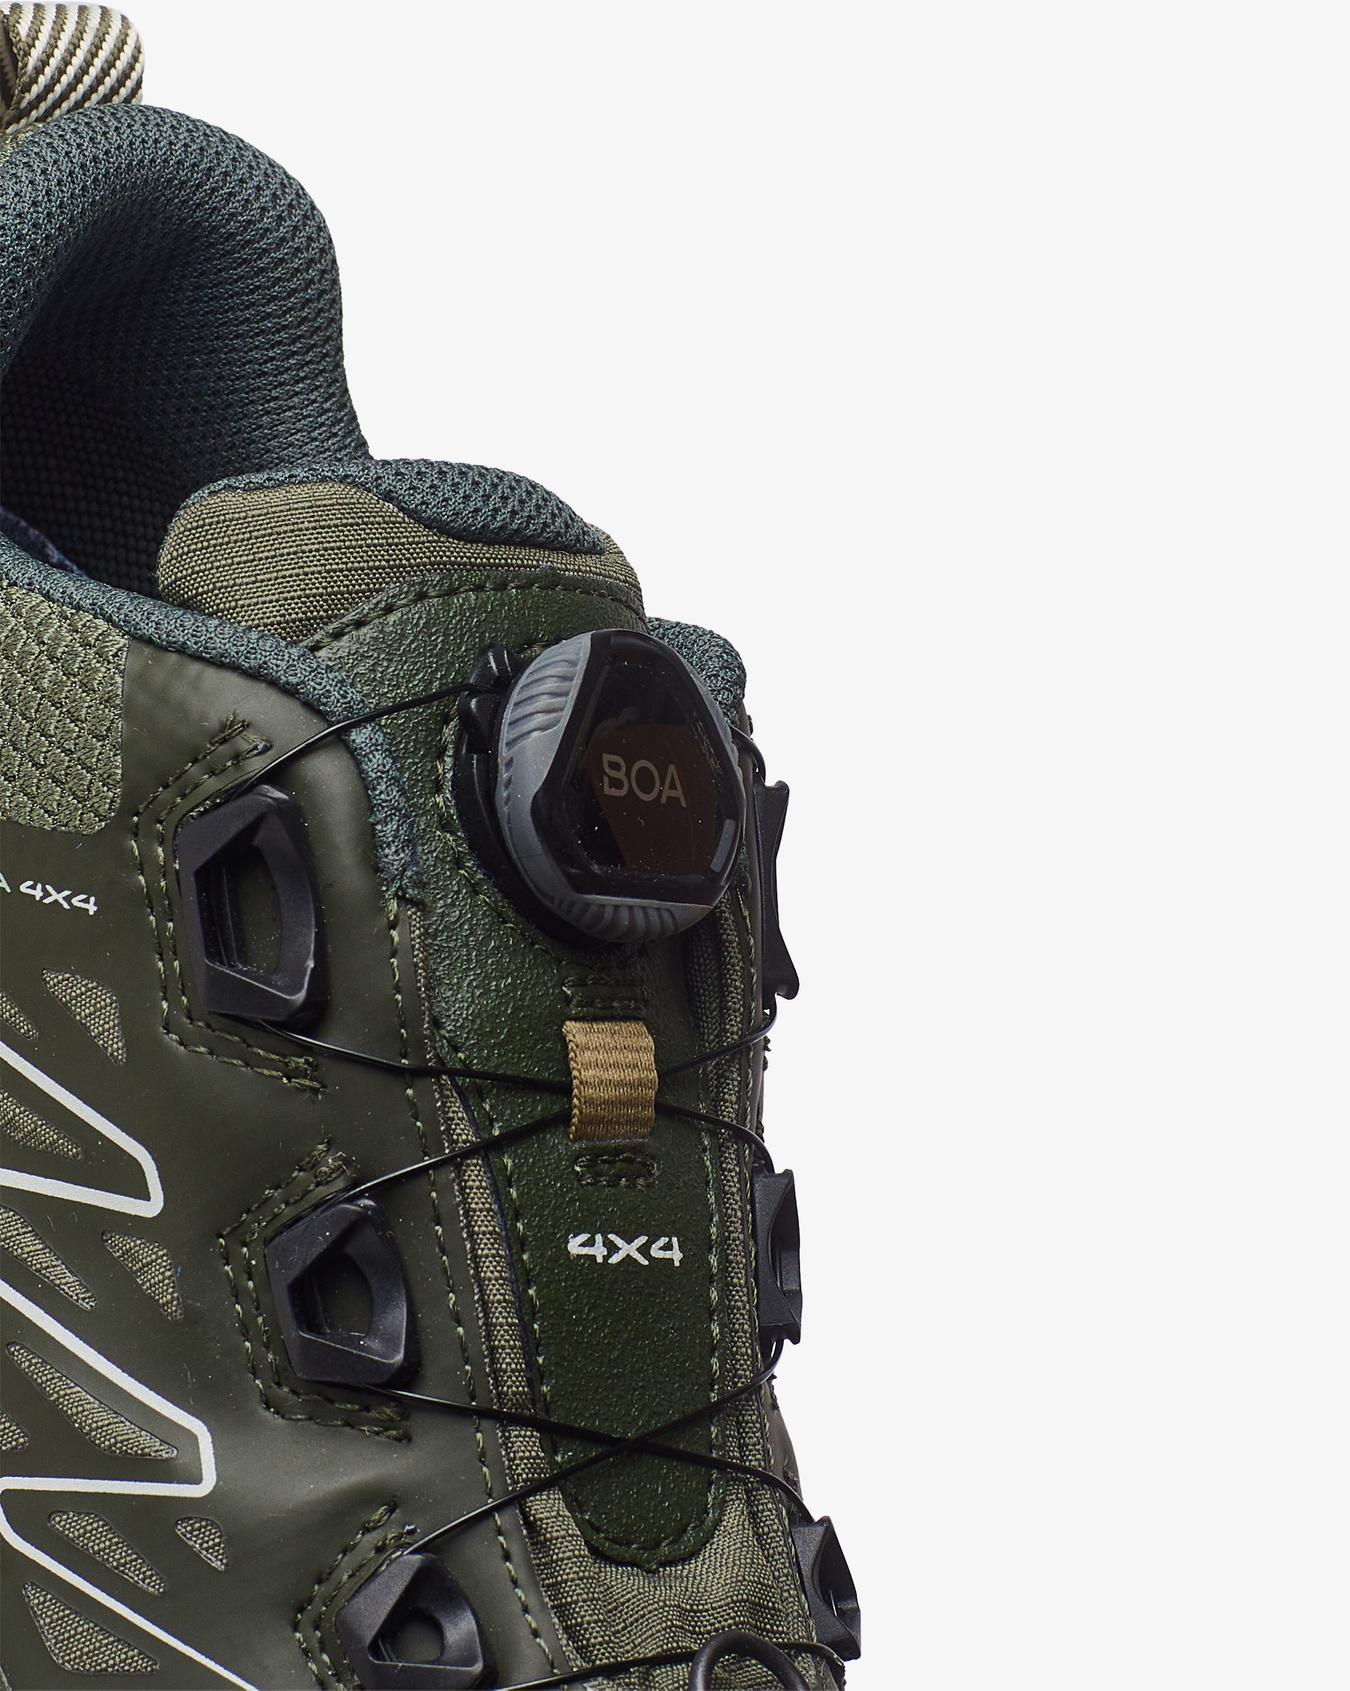 Anaconda 4x4 Boa GTX Hiking Schuh